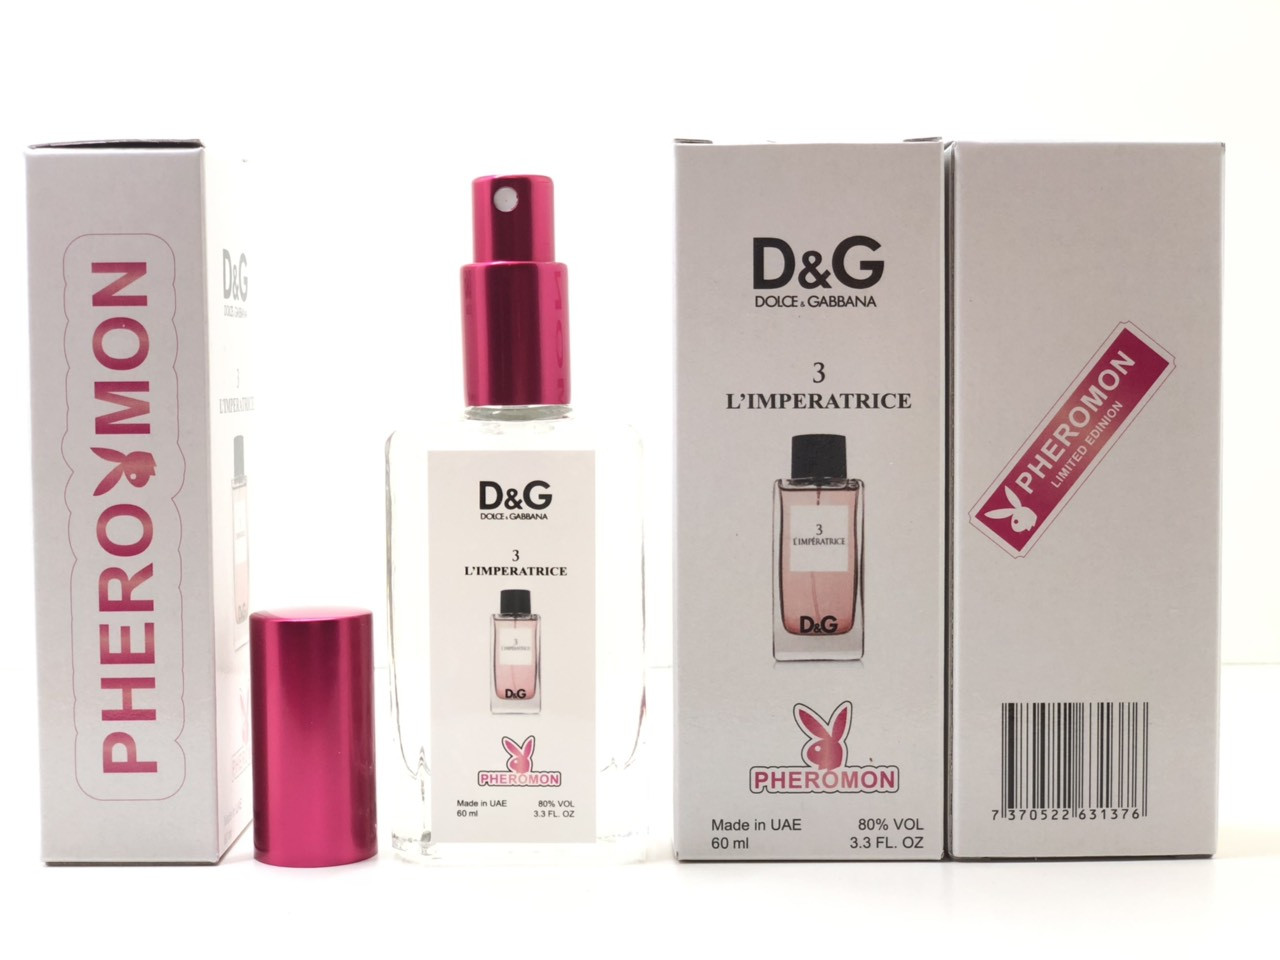 Женский парфюм Dolce & Gabbana L'Imperatrice №3 (реплика) тестер 60 ml в цветной упаковке с феромонами